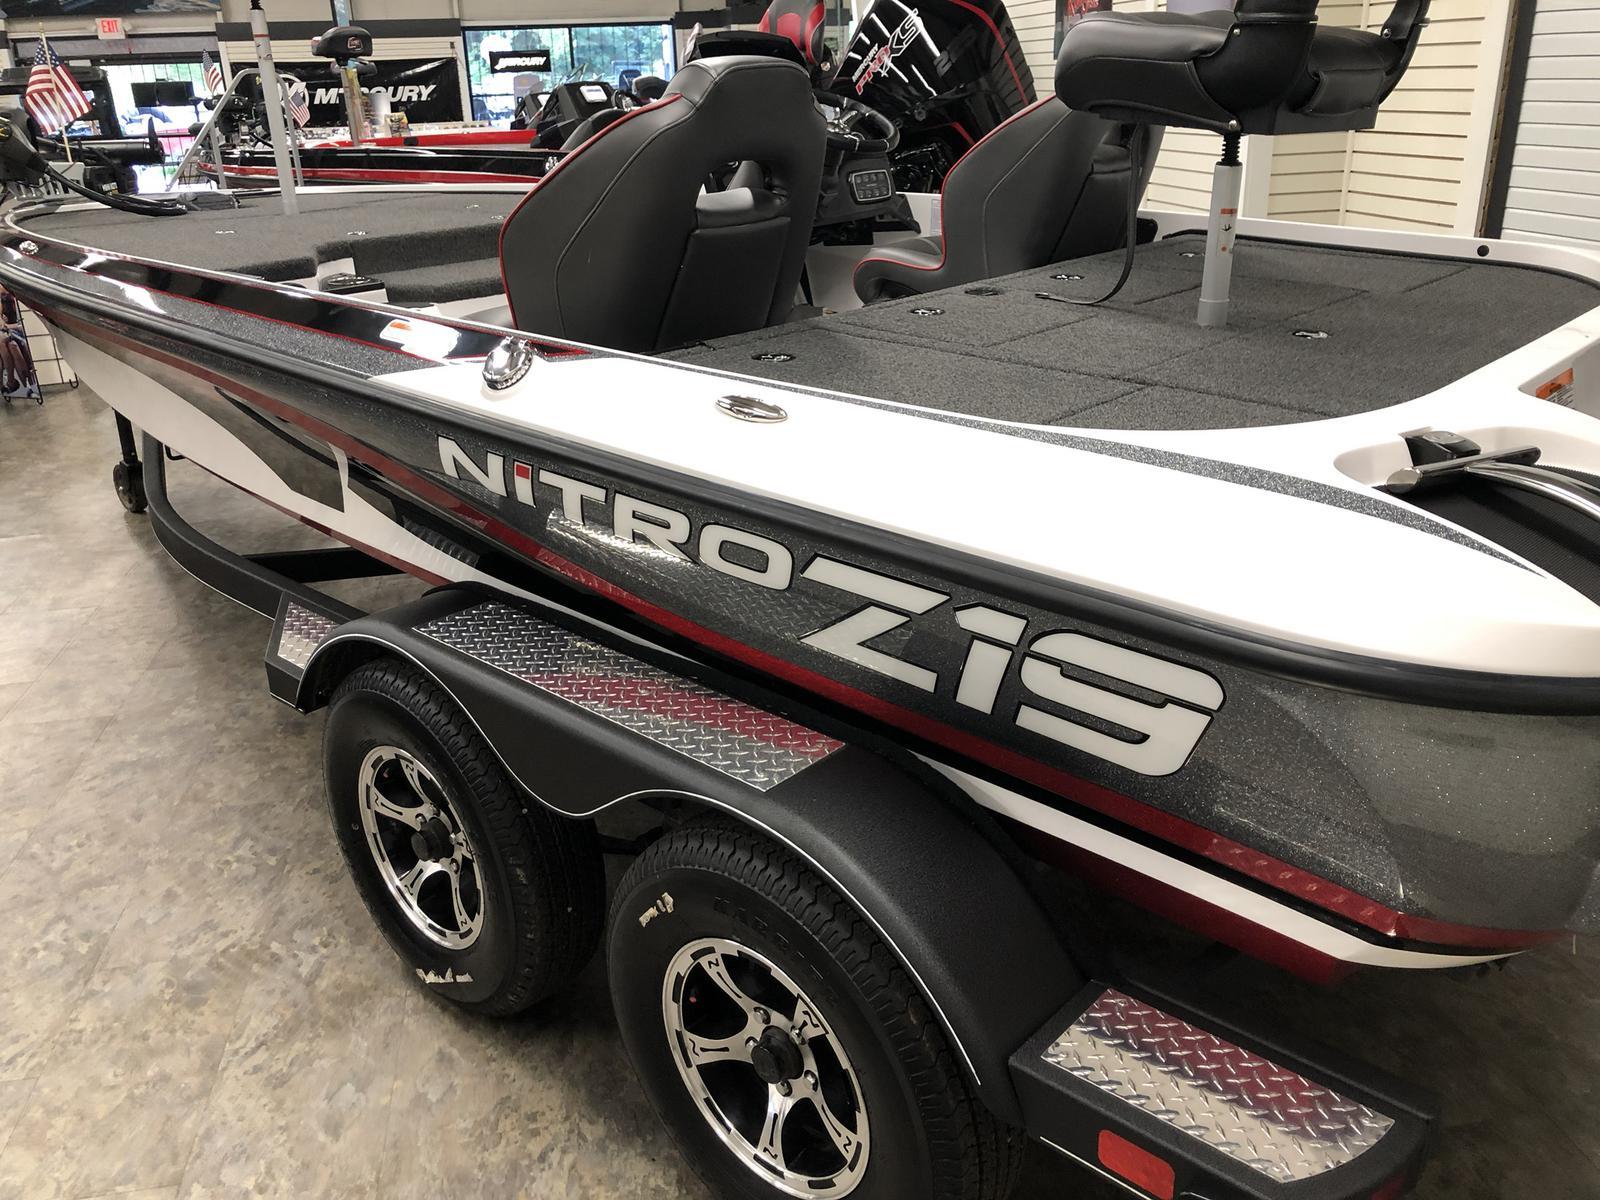 2019 Nitro boat for sale, model of the boat is Z19 & Image # 1 of 39